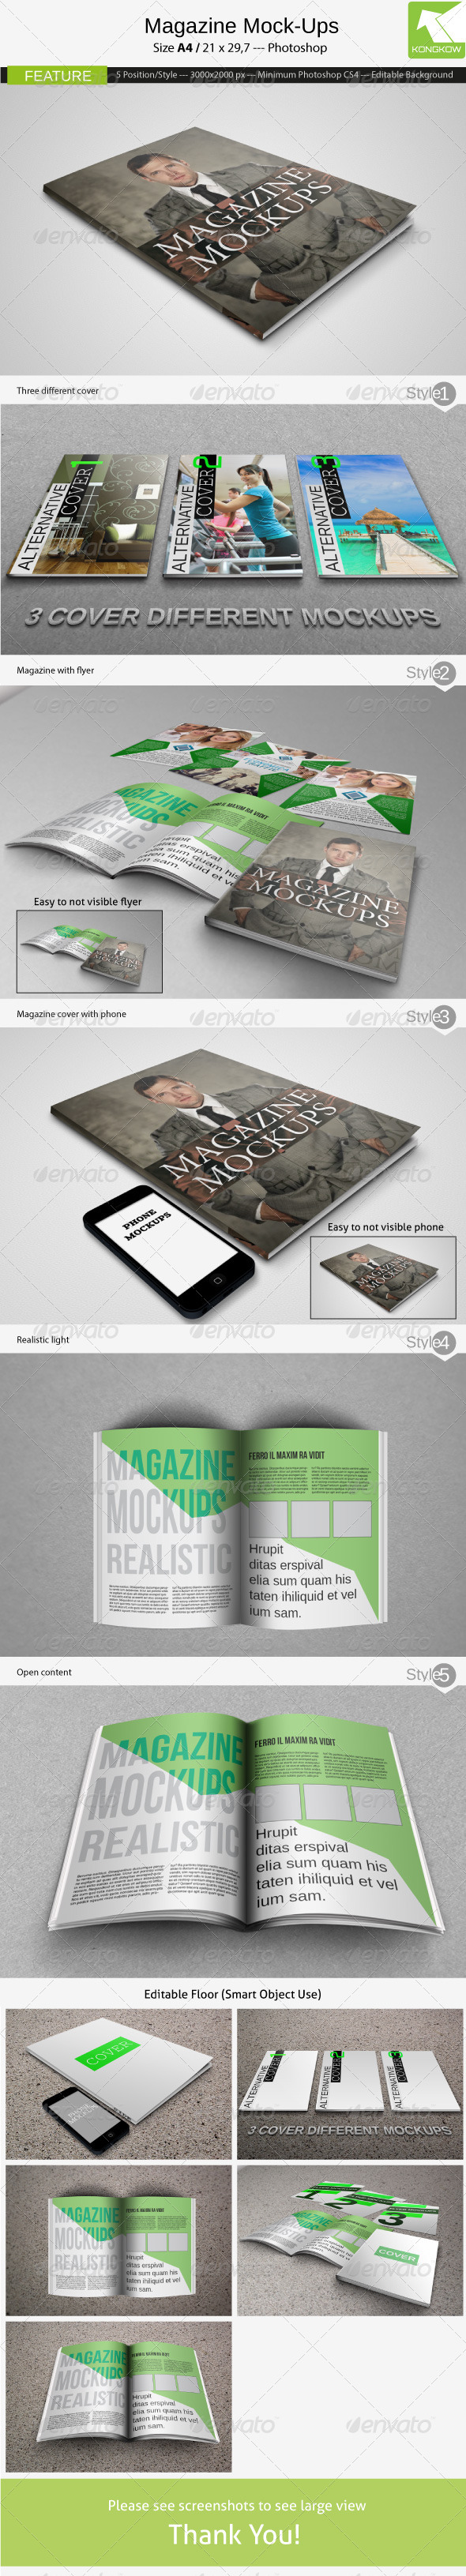 Magazine Mockups - Print Product Mock-Ups